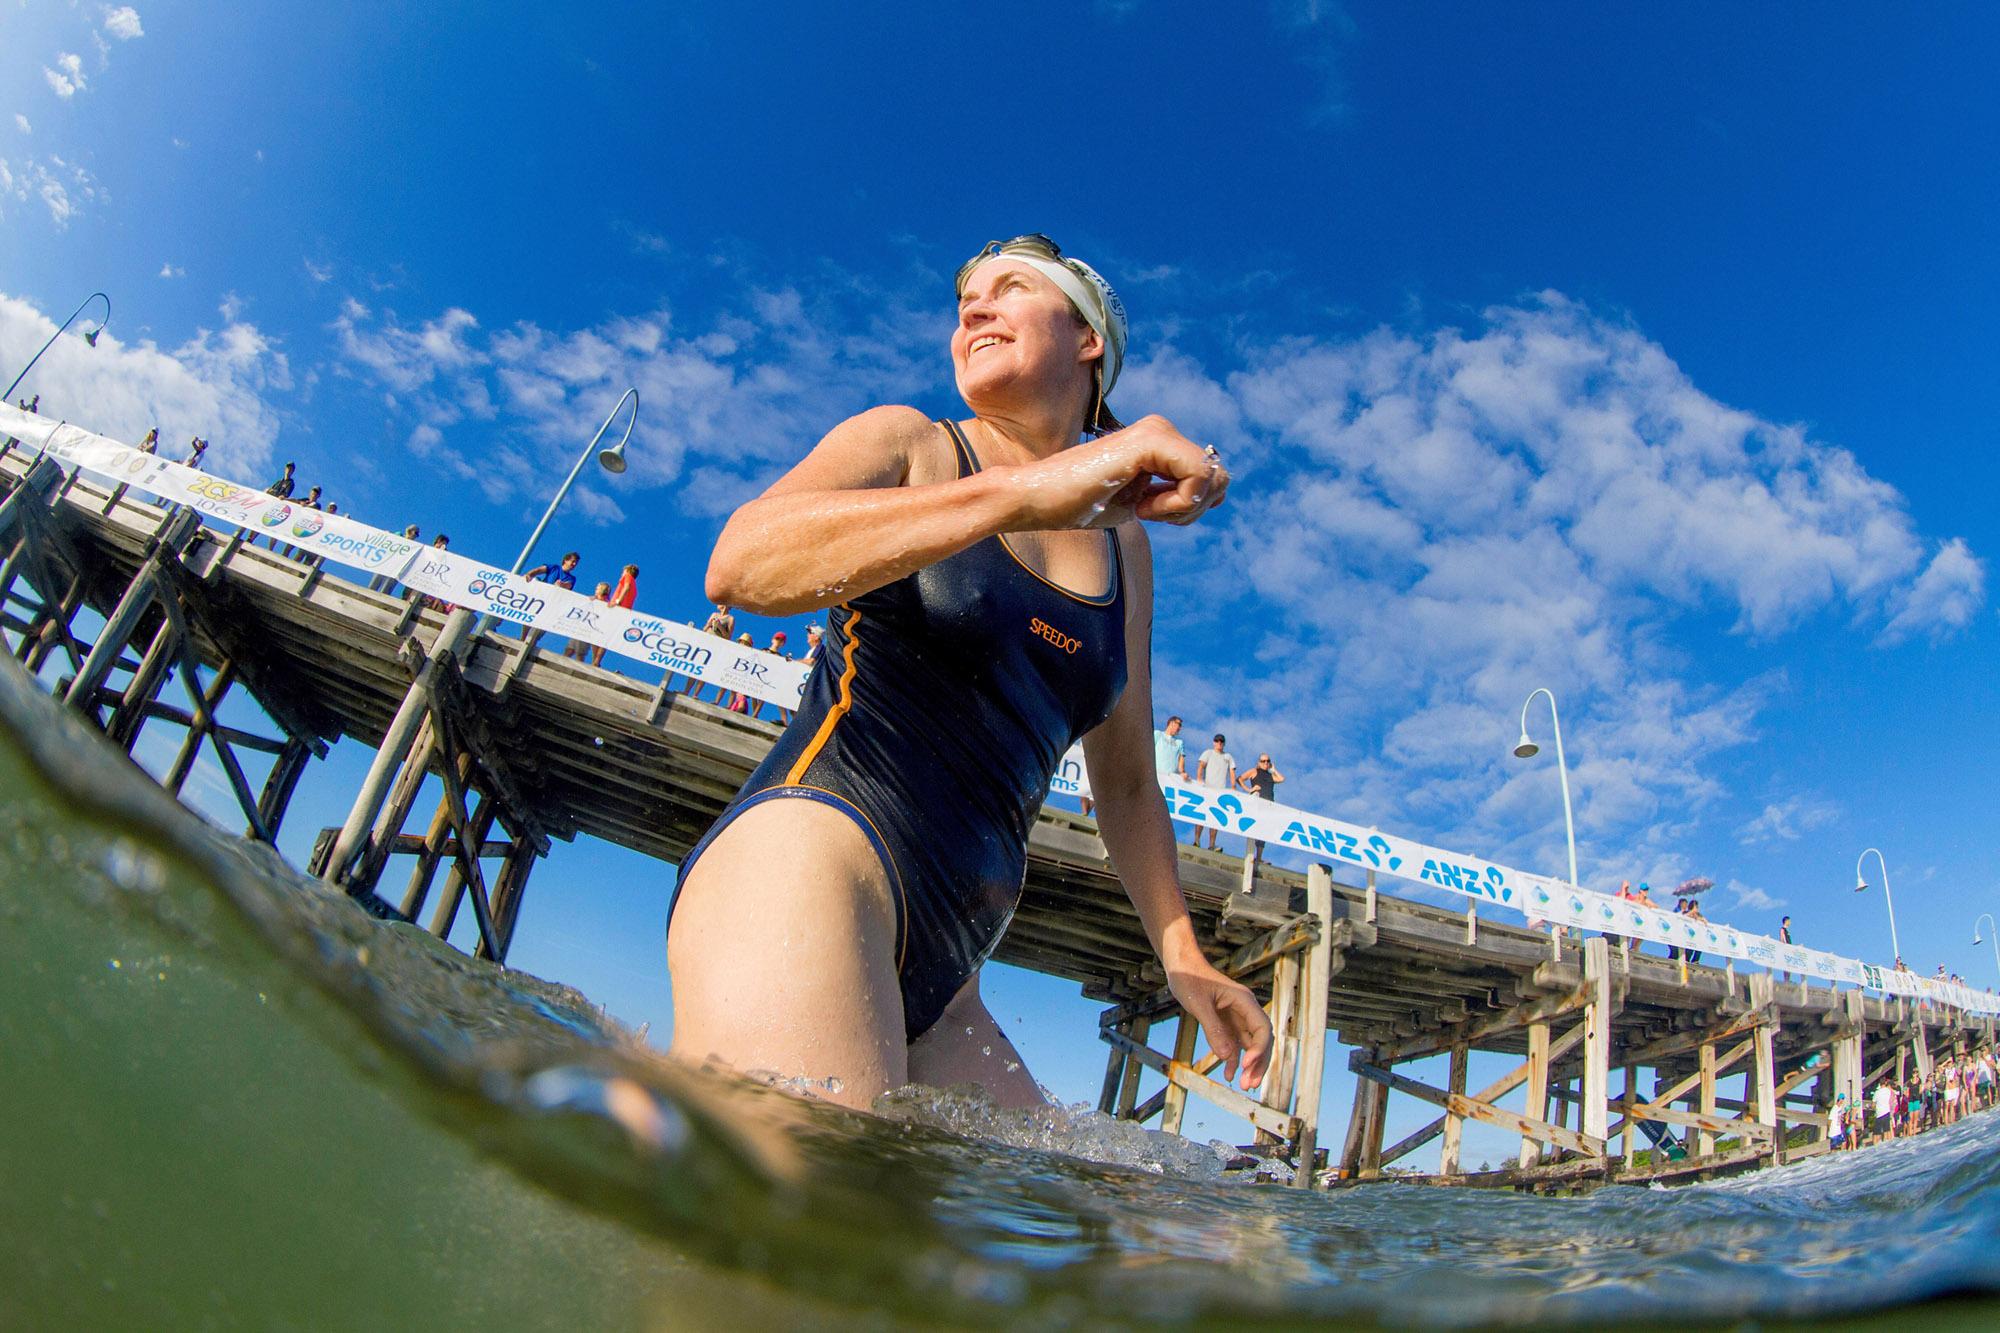 sports-water-photographer.jpg